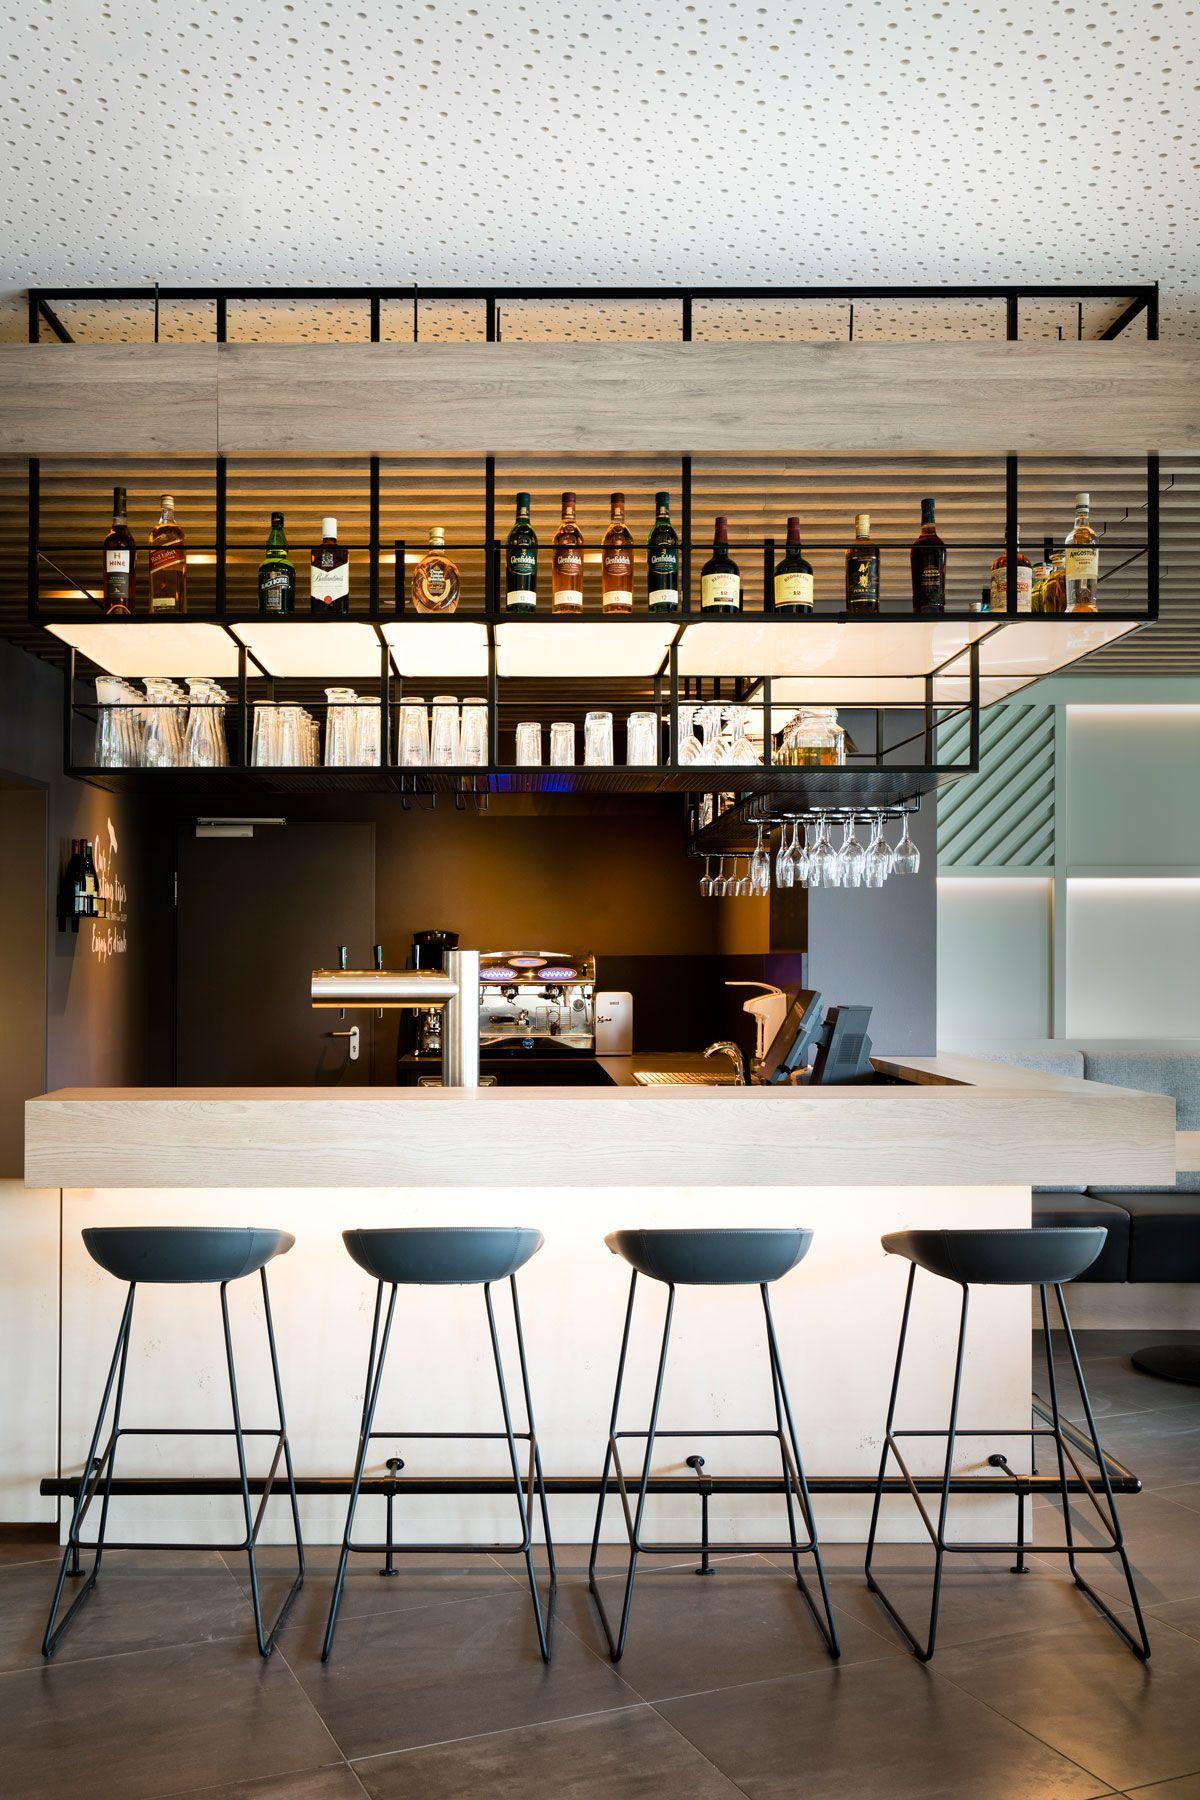 Bar Counter Barstool Clean Minimalistic Acomhotel M 252 Nchen Haar By Dia Dittel Architekten